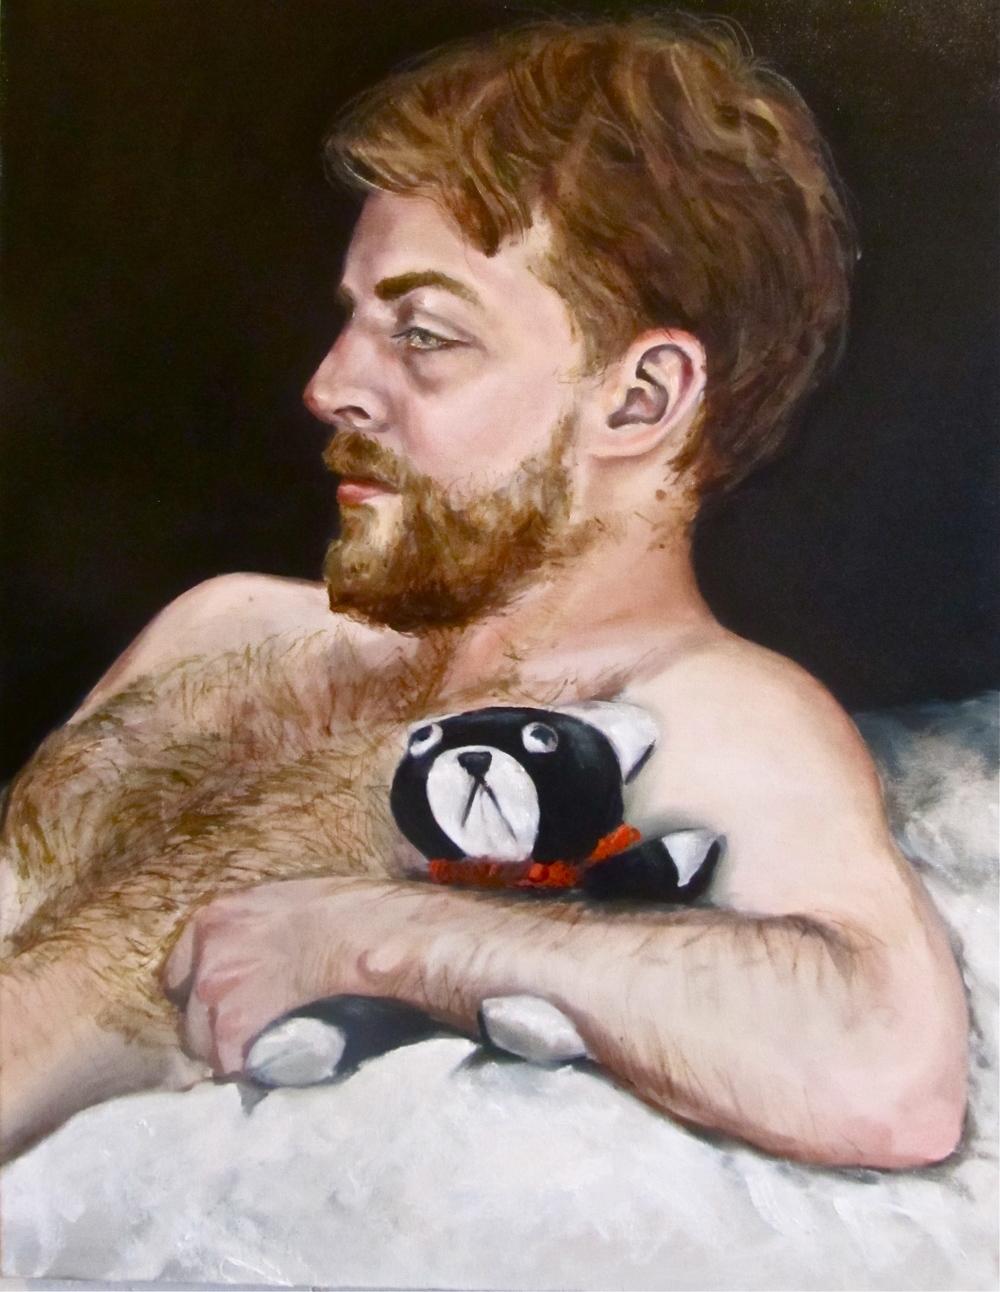 Alastair and his bear